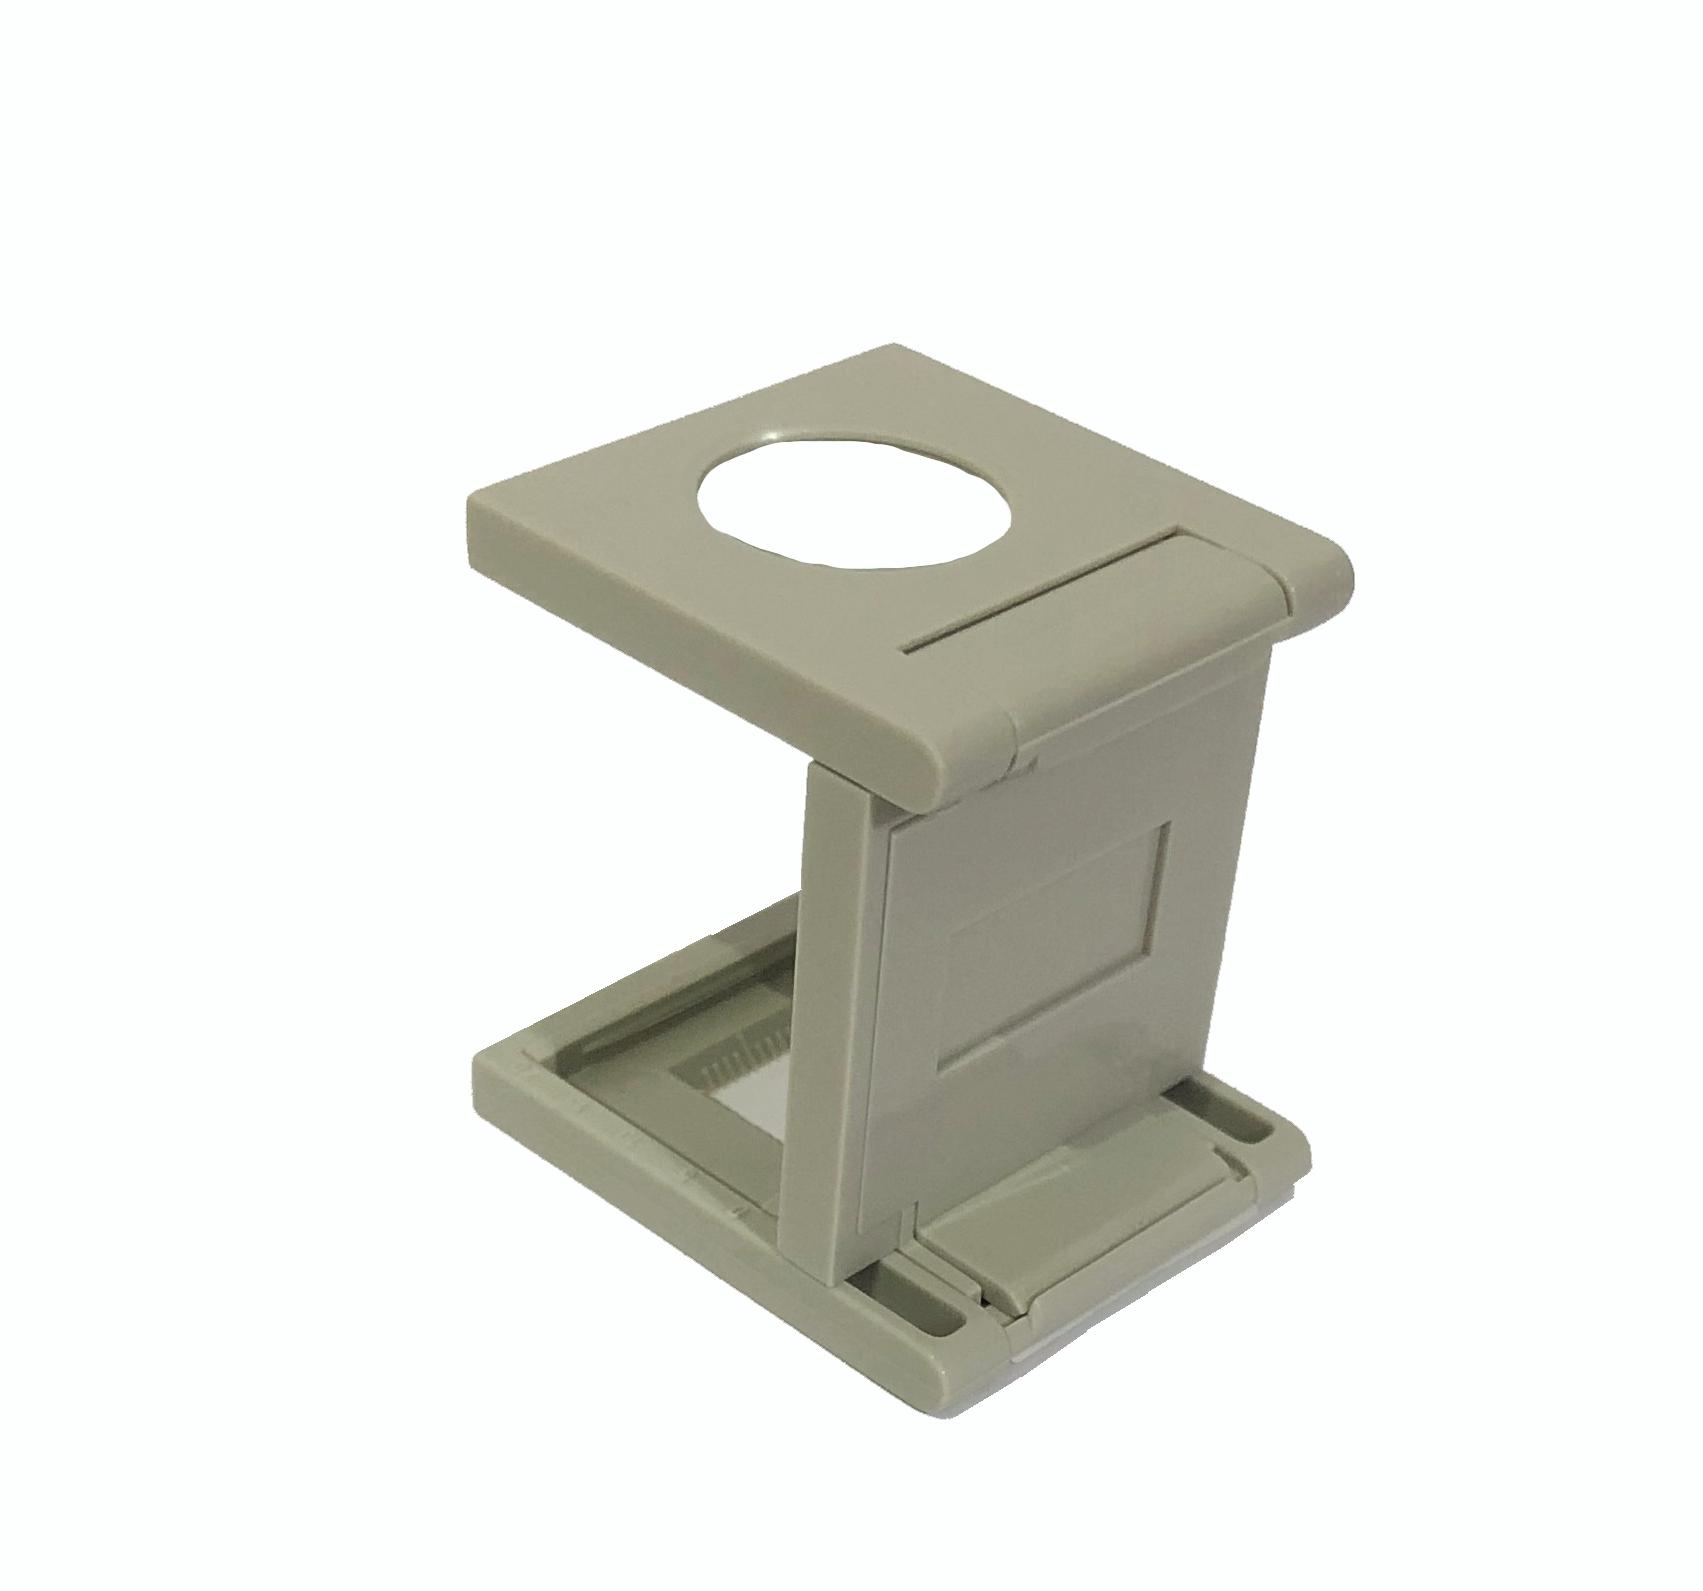 Lupa Contafio 10x | Plástico